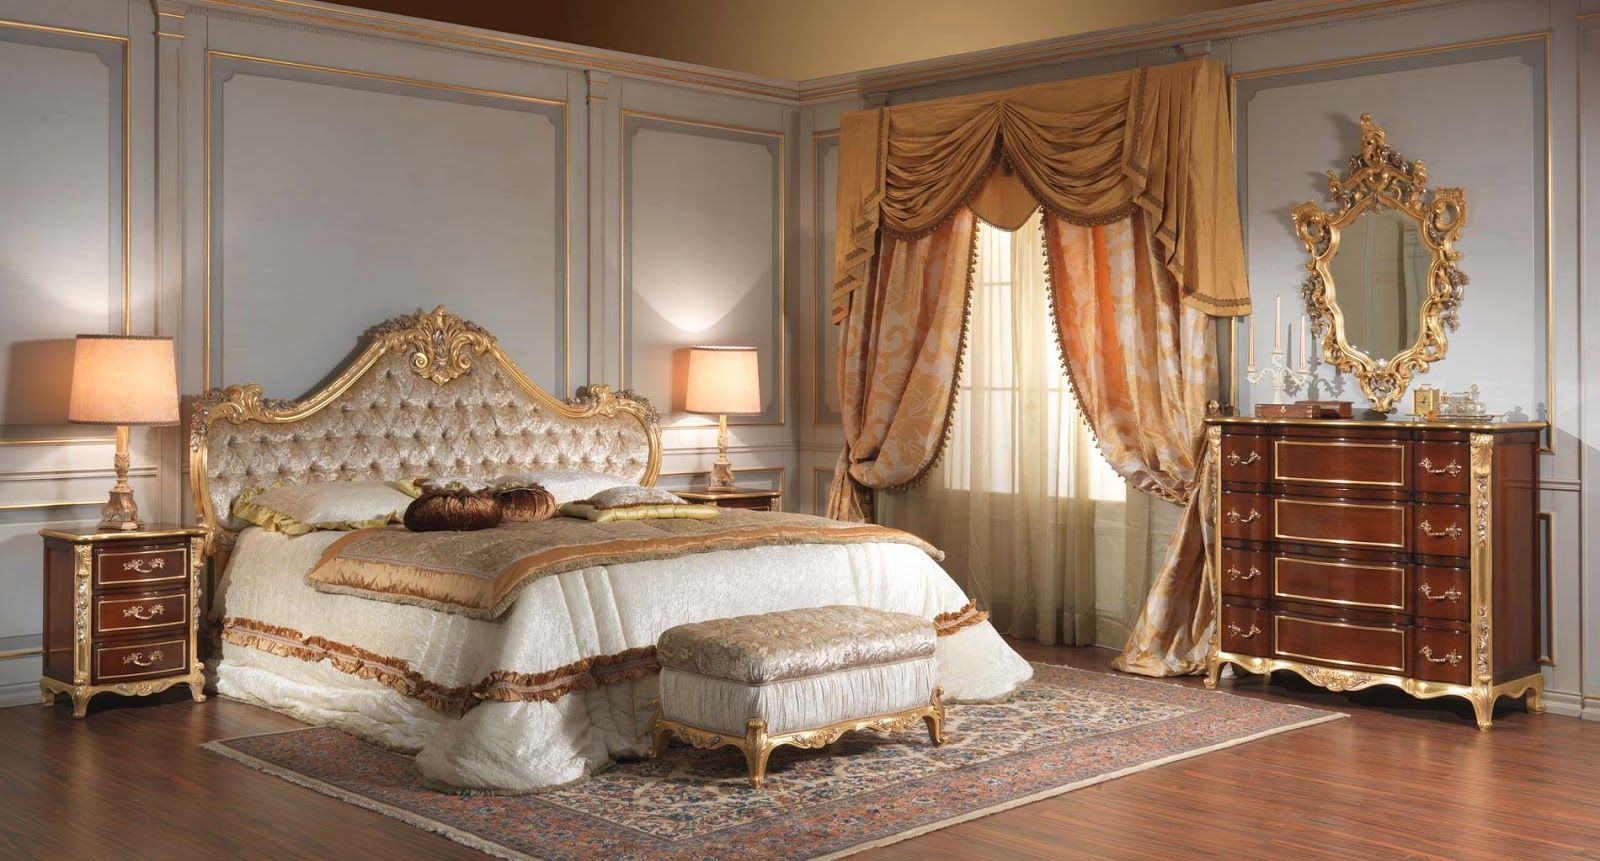 Dormitorios Matrimonio Clasicos Buscar Con Google Dormitorios  ~ Decoracion Dormitorios Matrimoniales